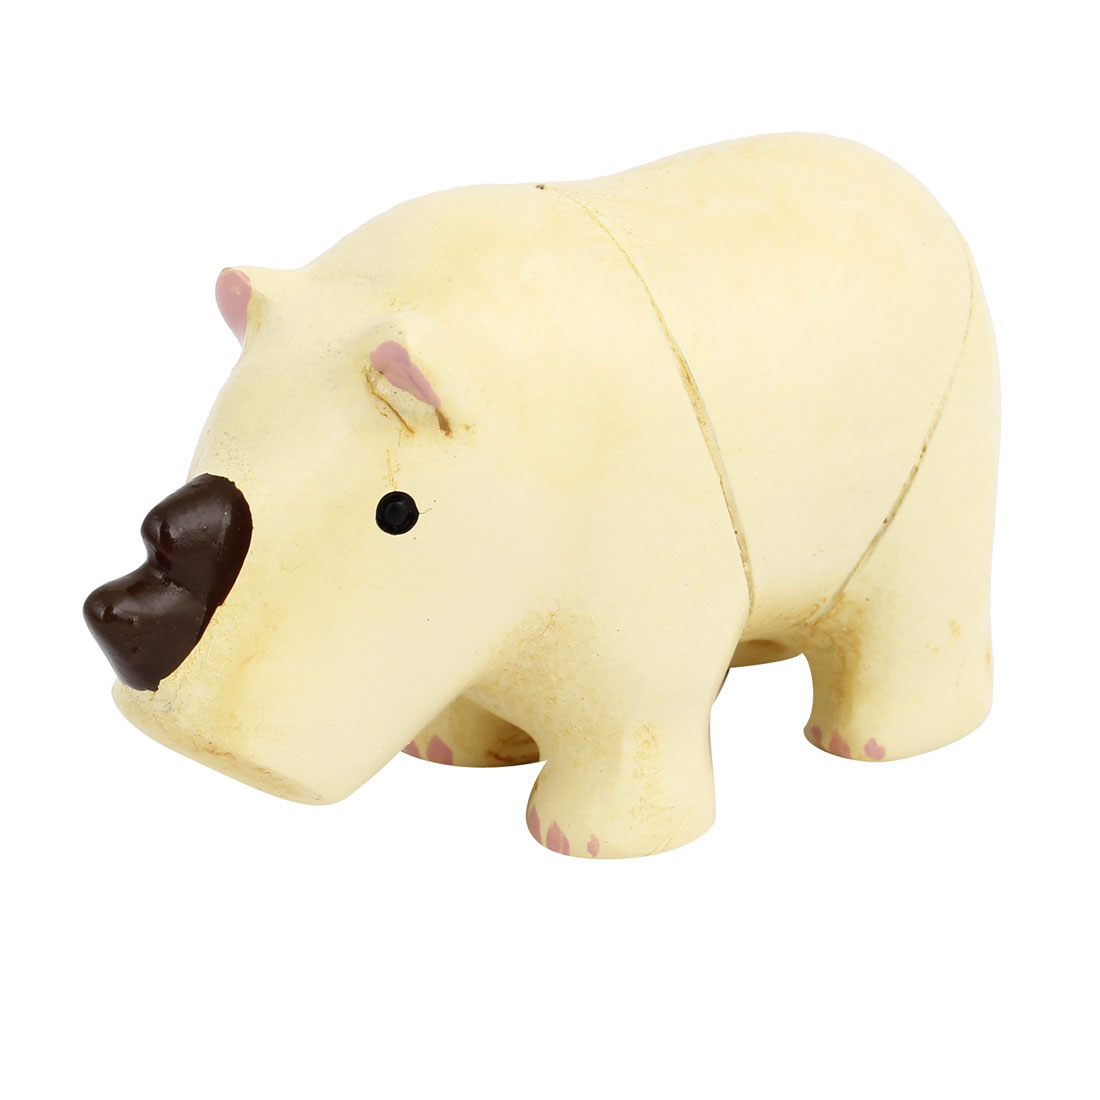 Tabletop Adorn Simulation Rhinoceros Shape Ornament Beige